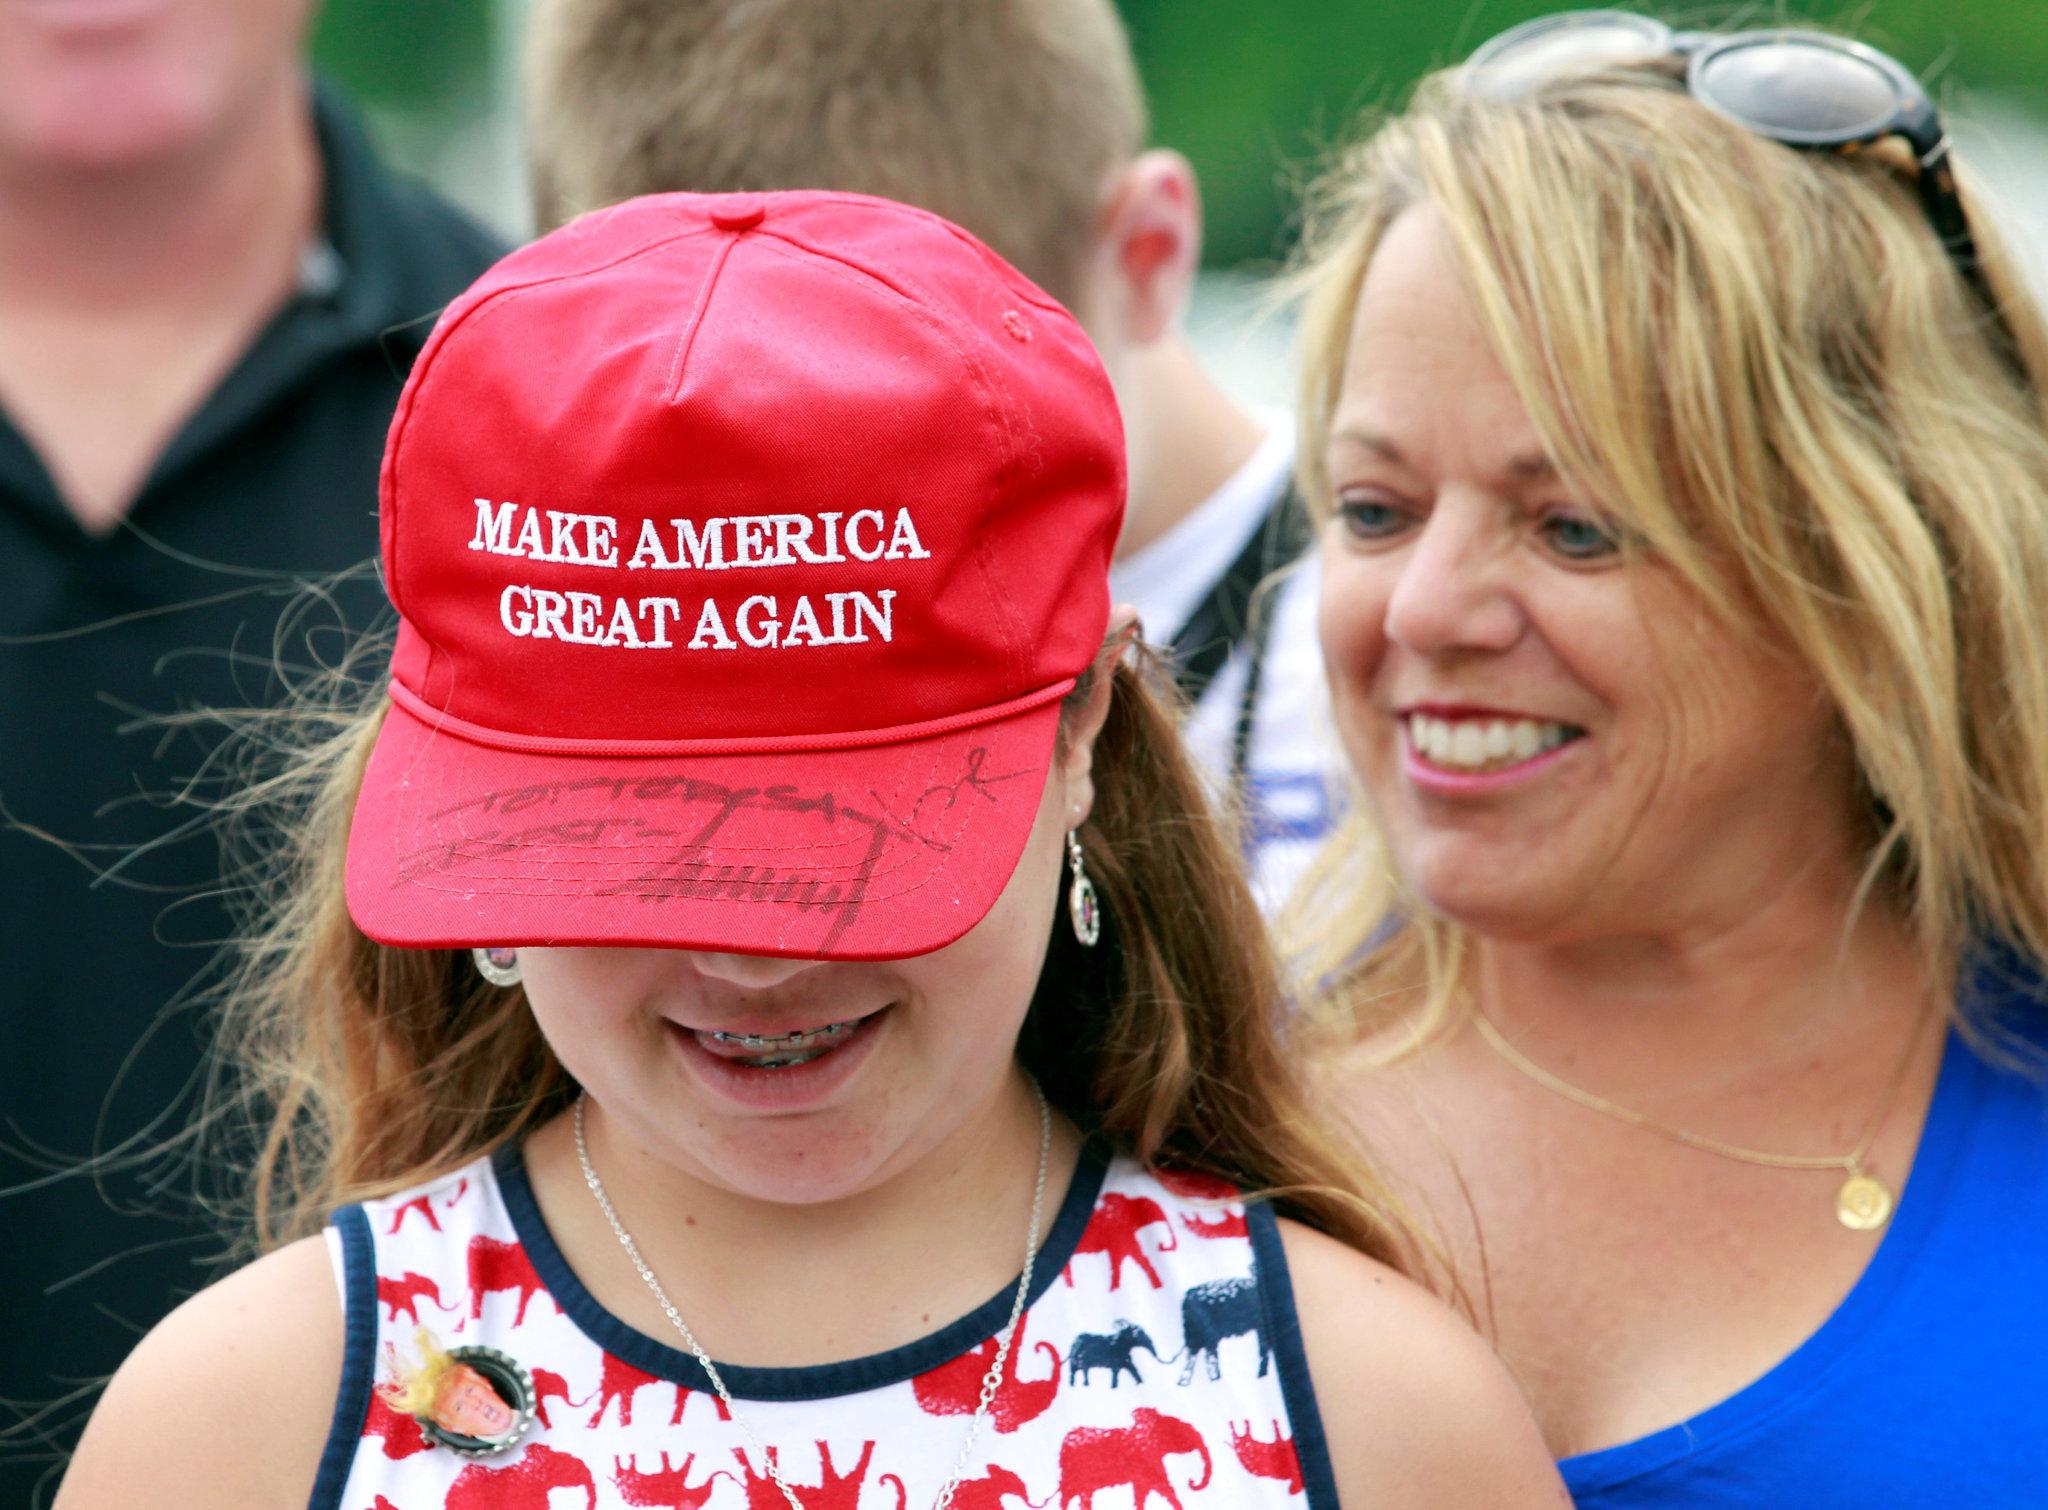 Hardwick Trump Ets Hidden Sd Faithful Of Team Spanos The